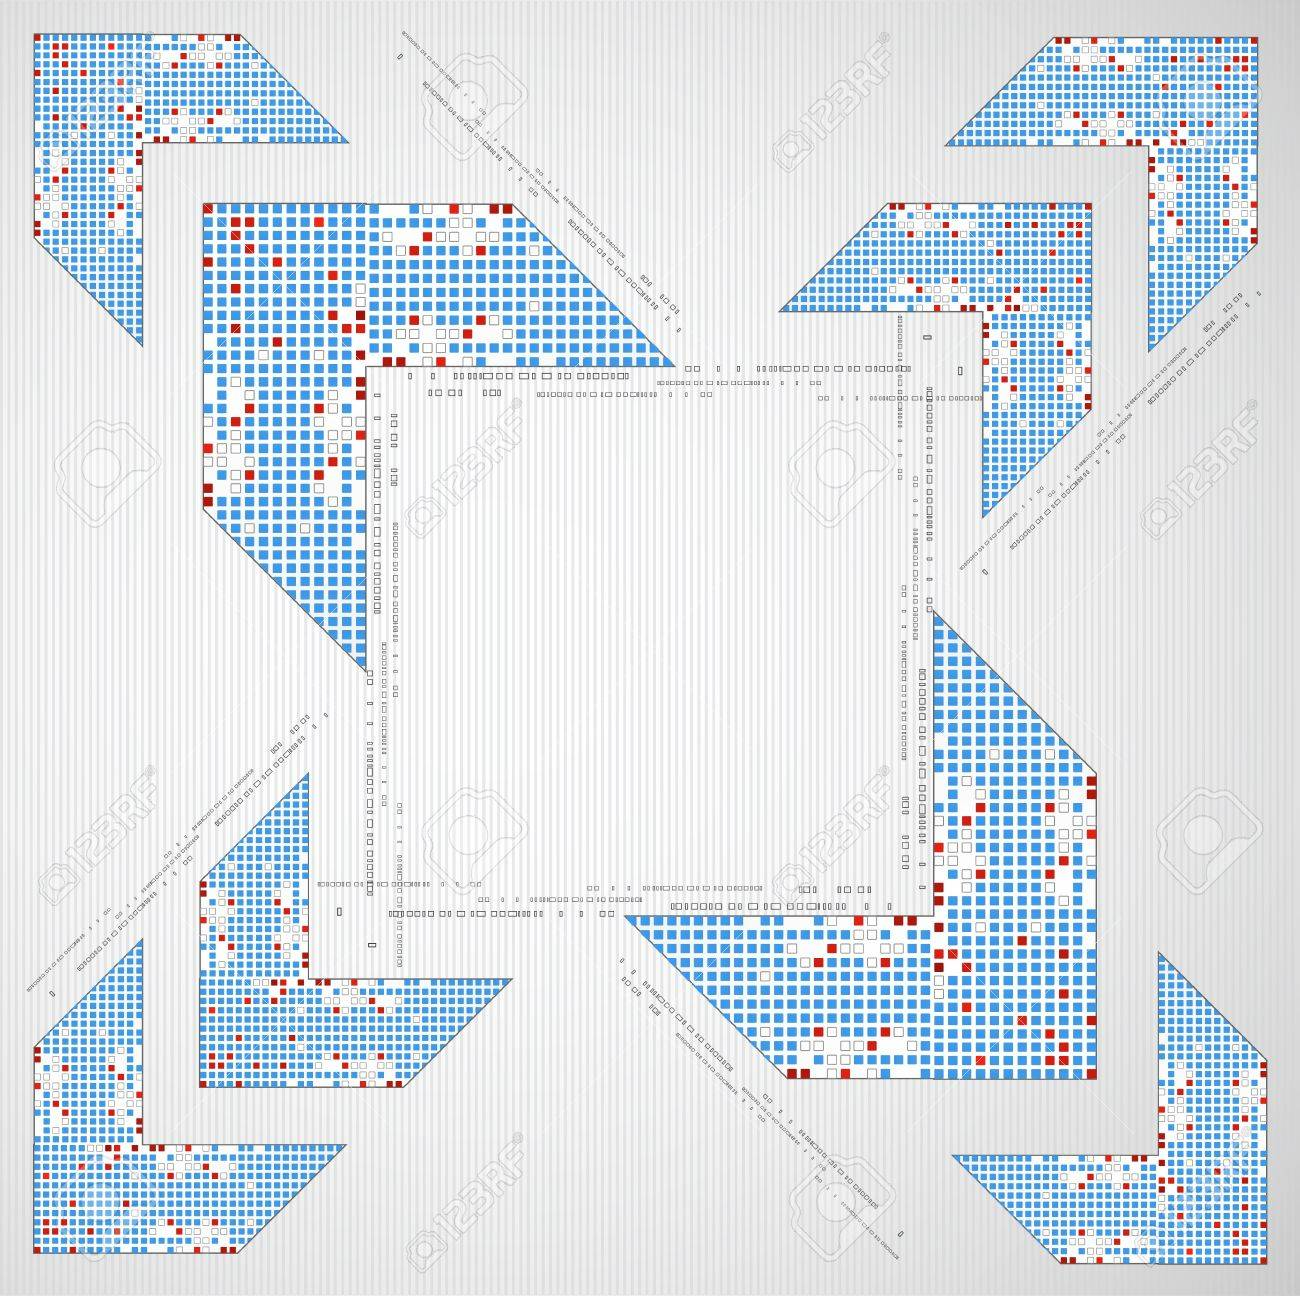 Abstract background with arrow. Pixel art. Vector Stock Vector - 17754701